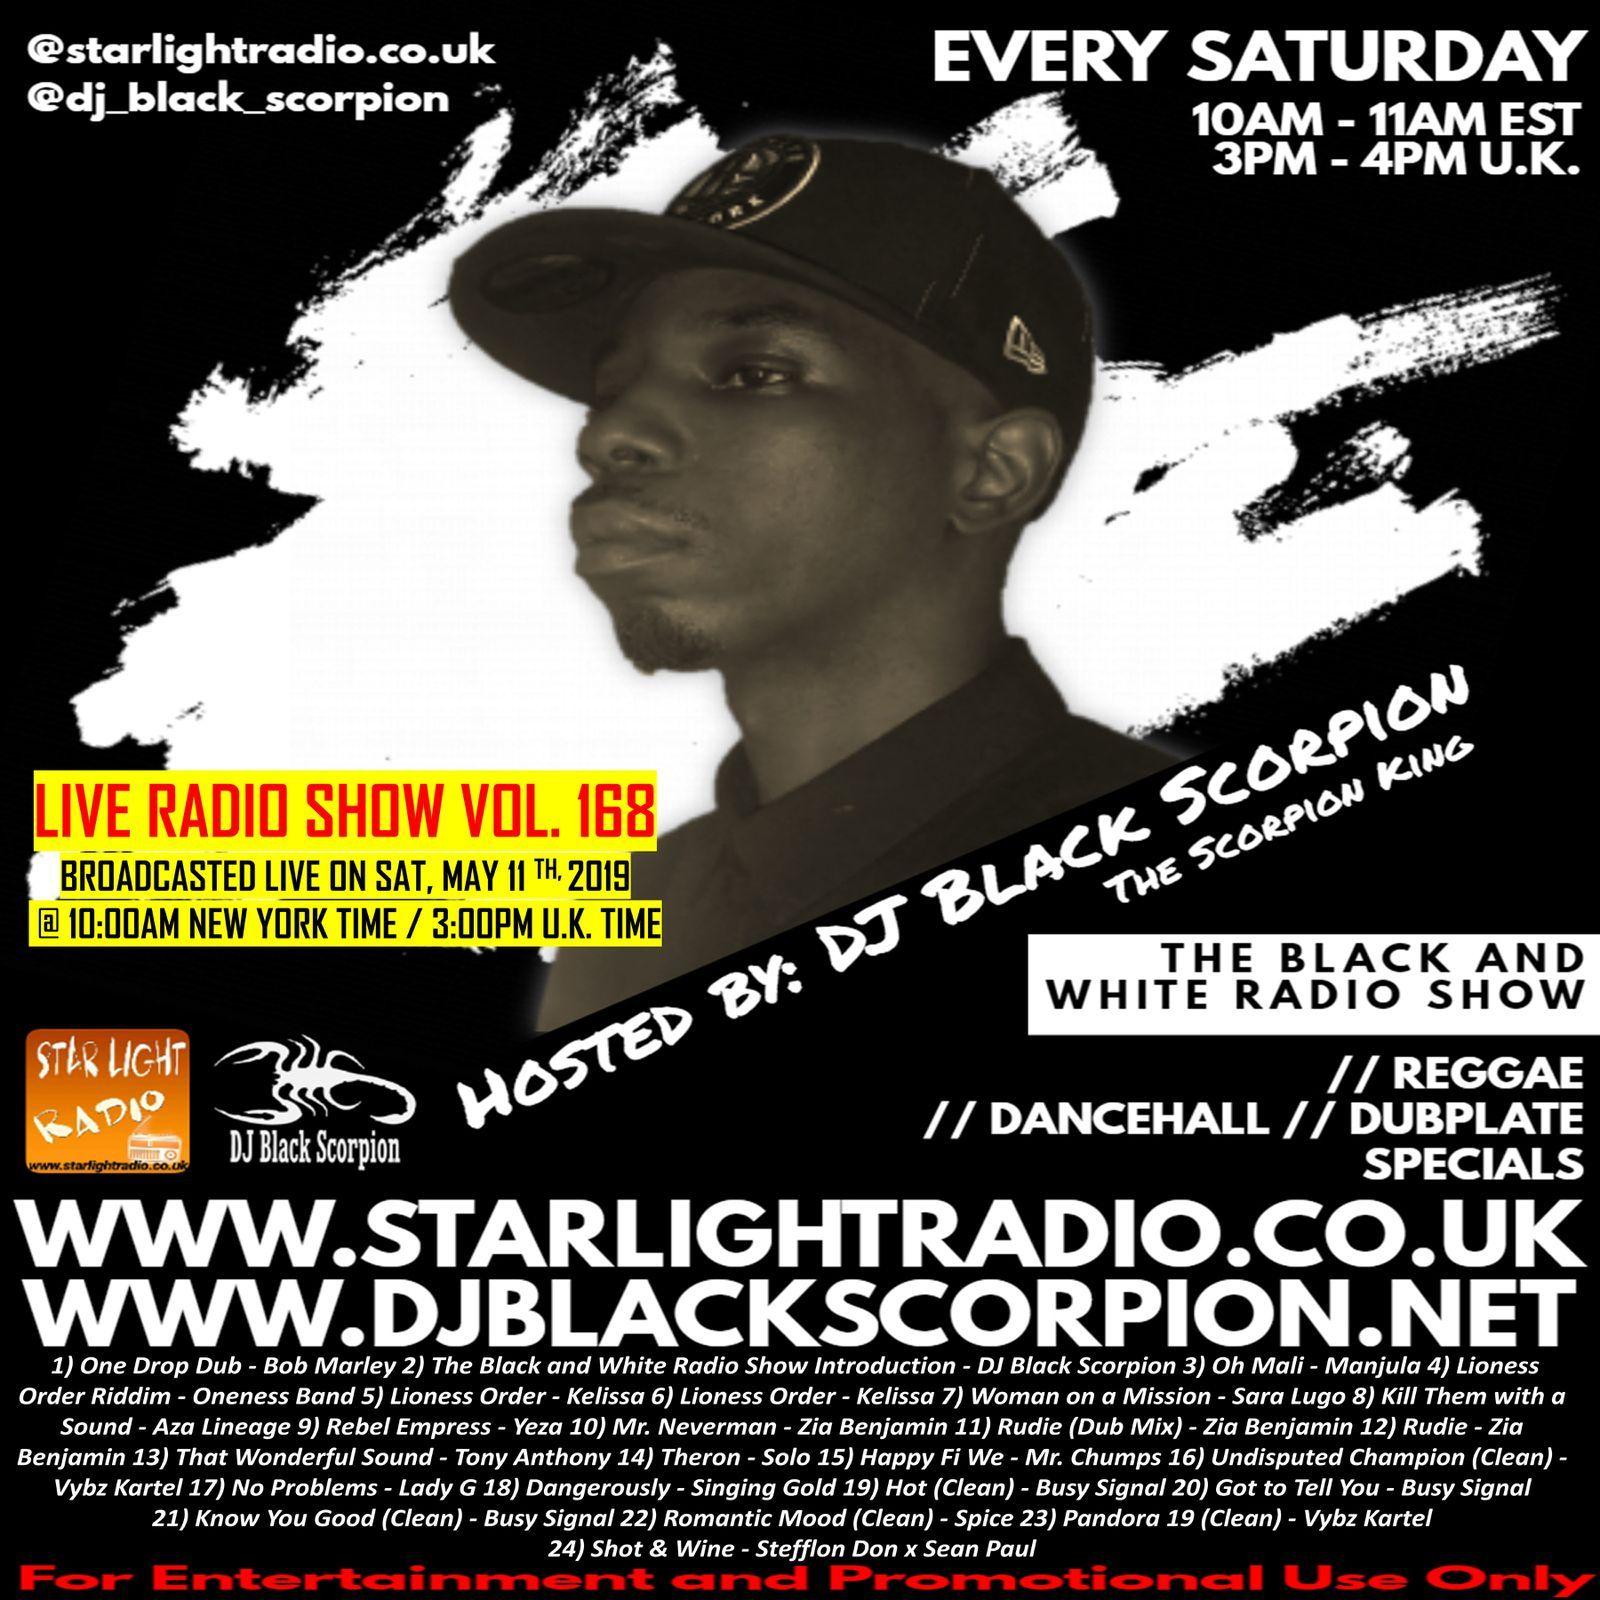 DJ Black Scorpion (Reggae x Dancehall) on Star Light Radio (5-11-19